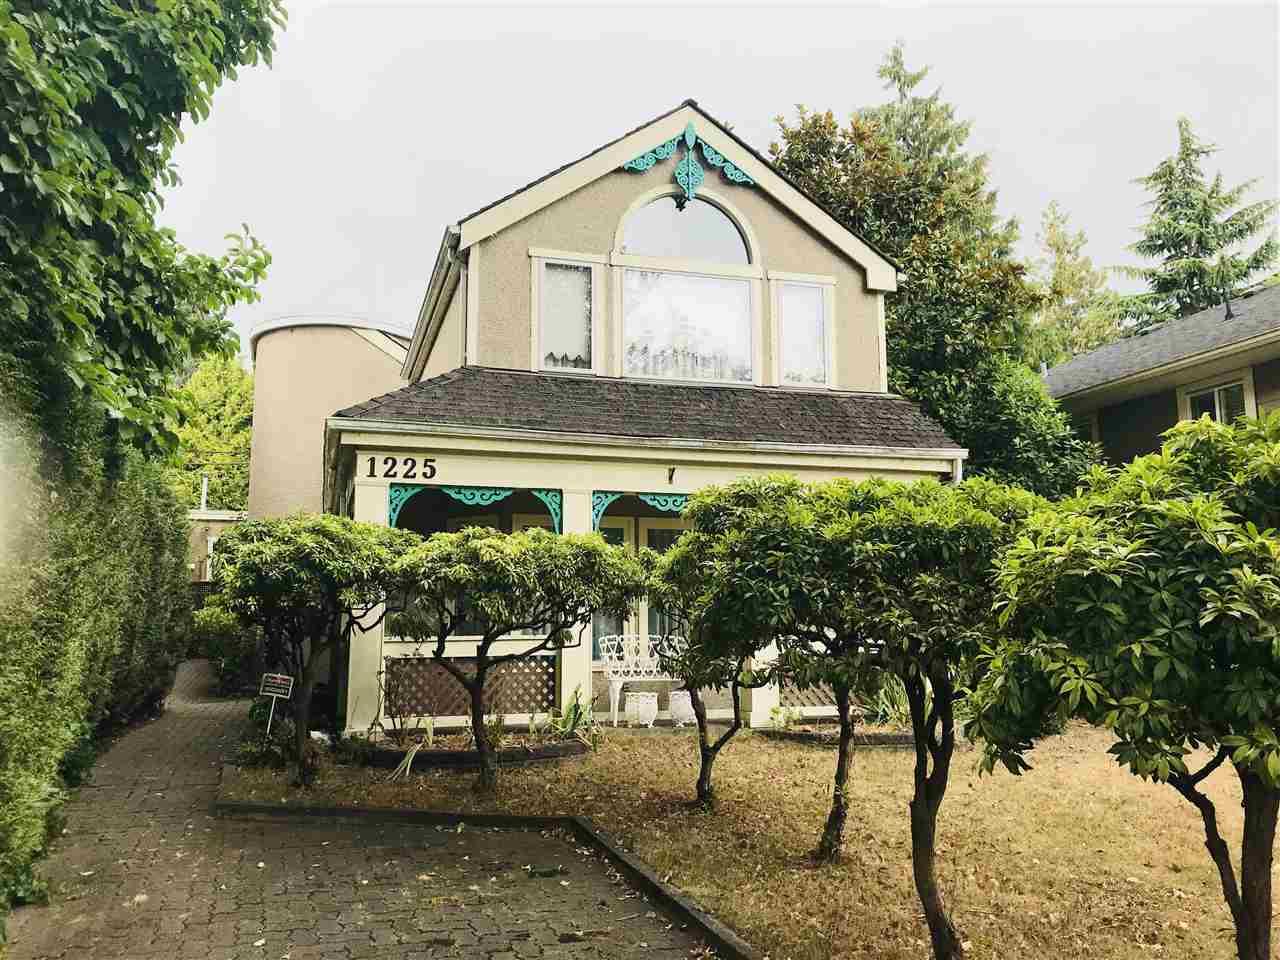 Sold: 1225 Park Drive, Vancouver, BC